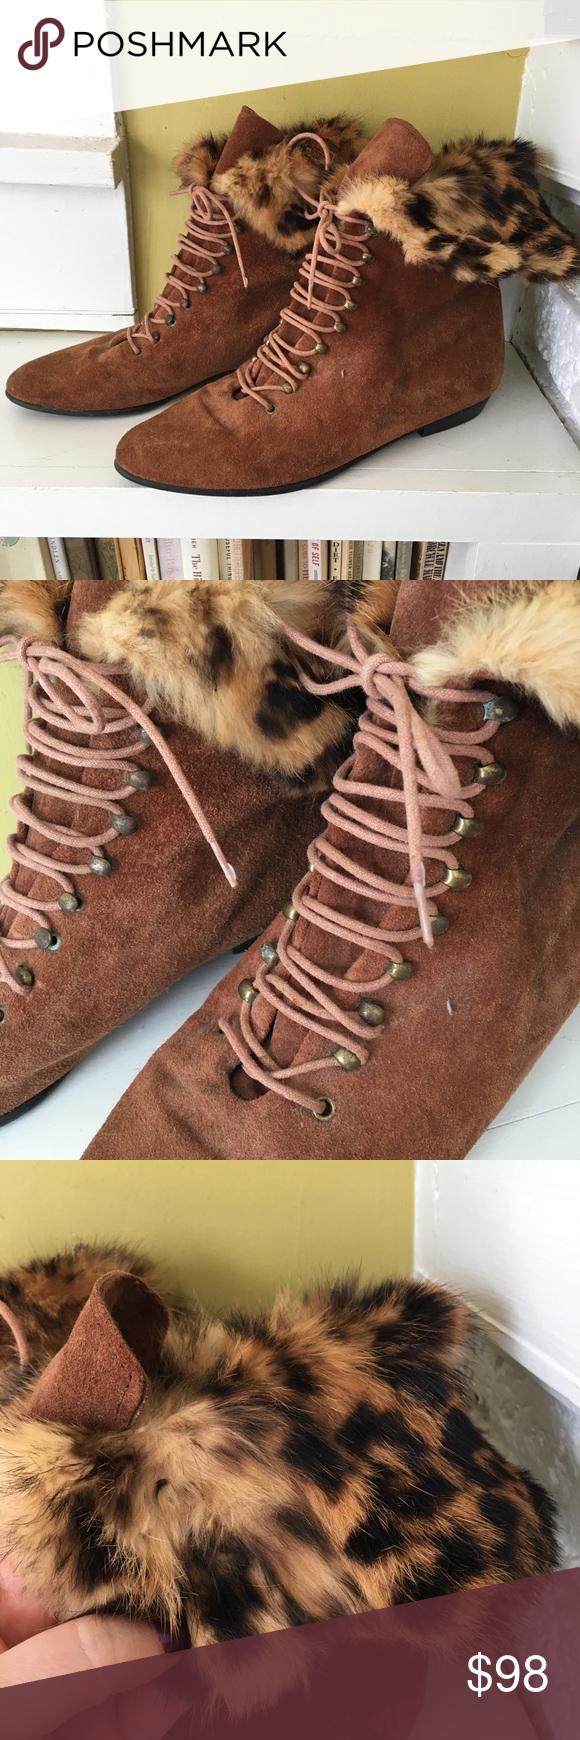 vintage Fur & Leather Lace Up Boots Cognac sz 9 These are amazing vintage boots….